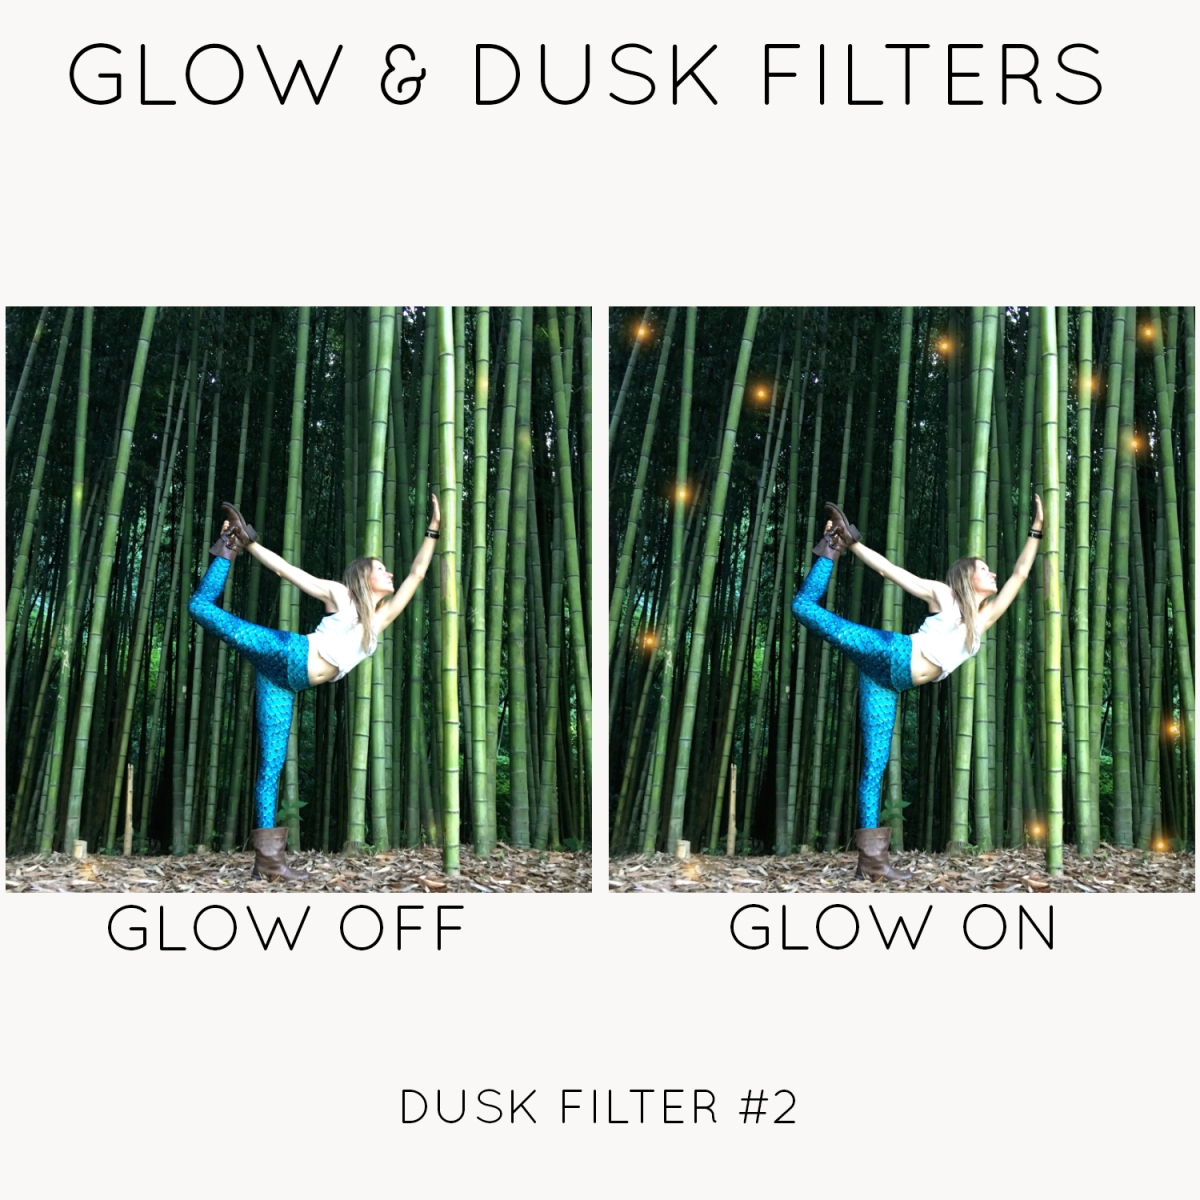 dusk-filters